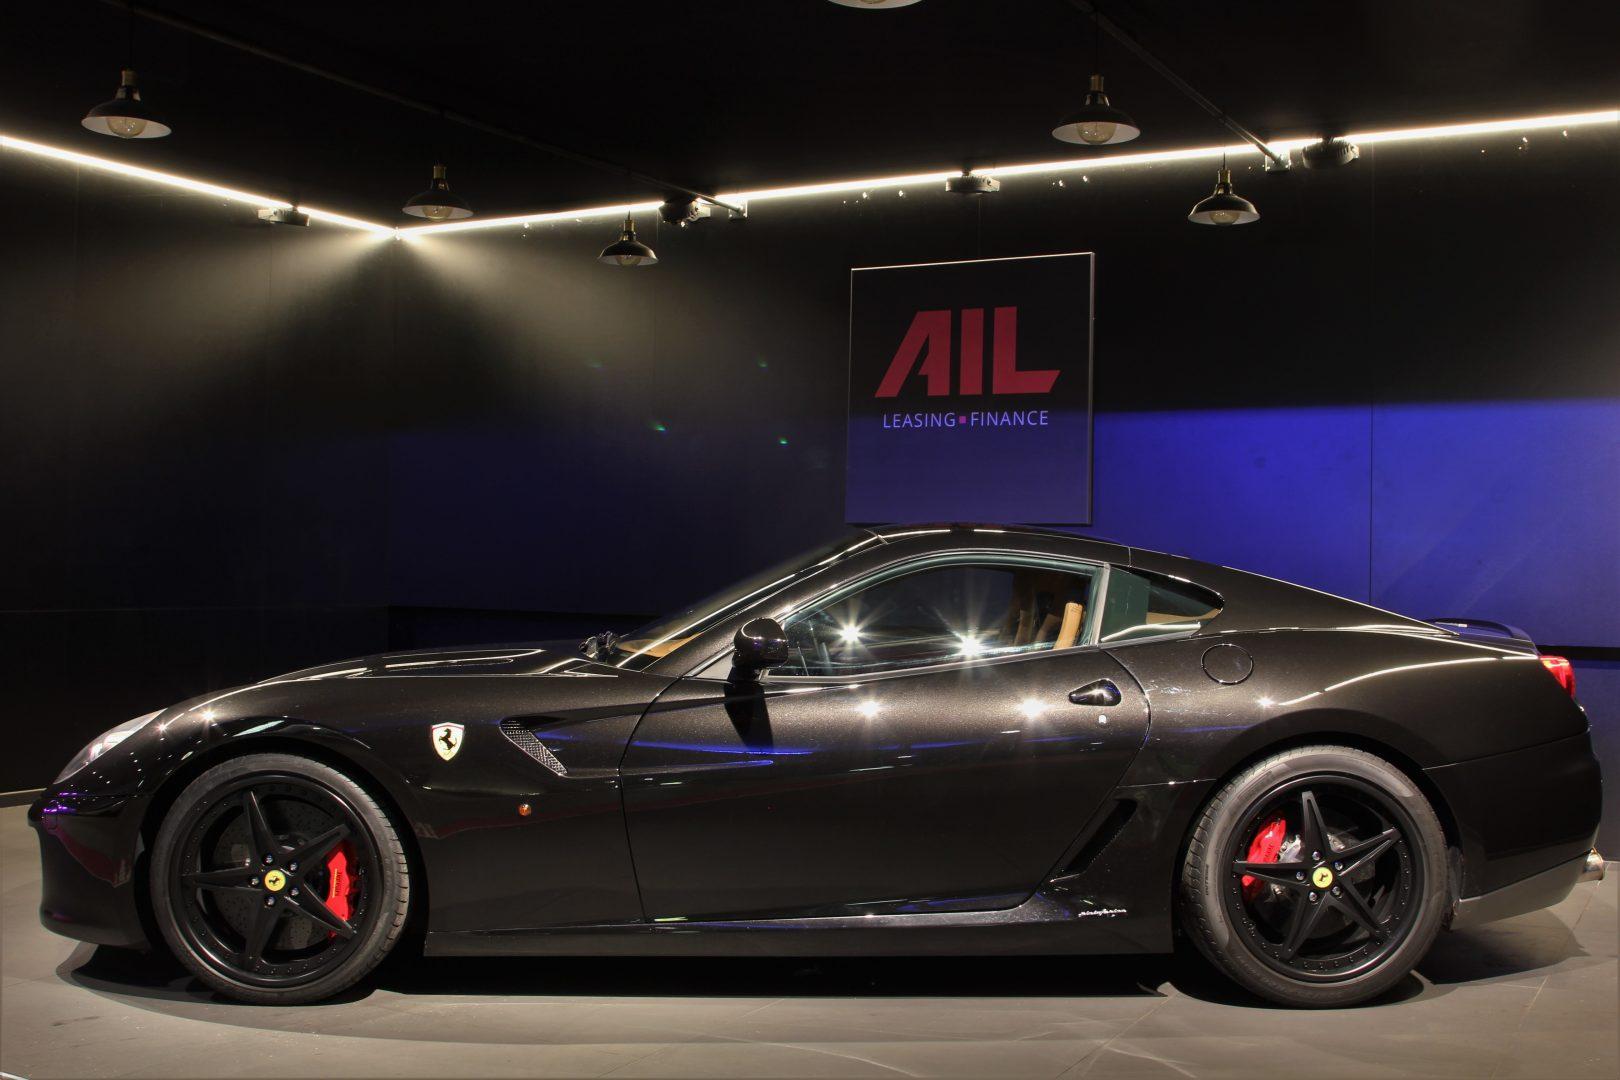 AIL Ferrari 599 GTB 2